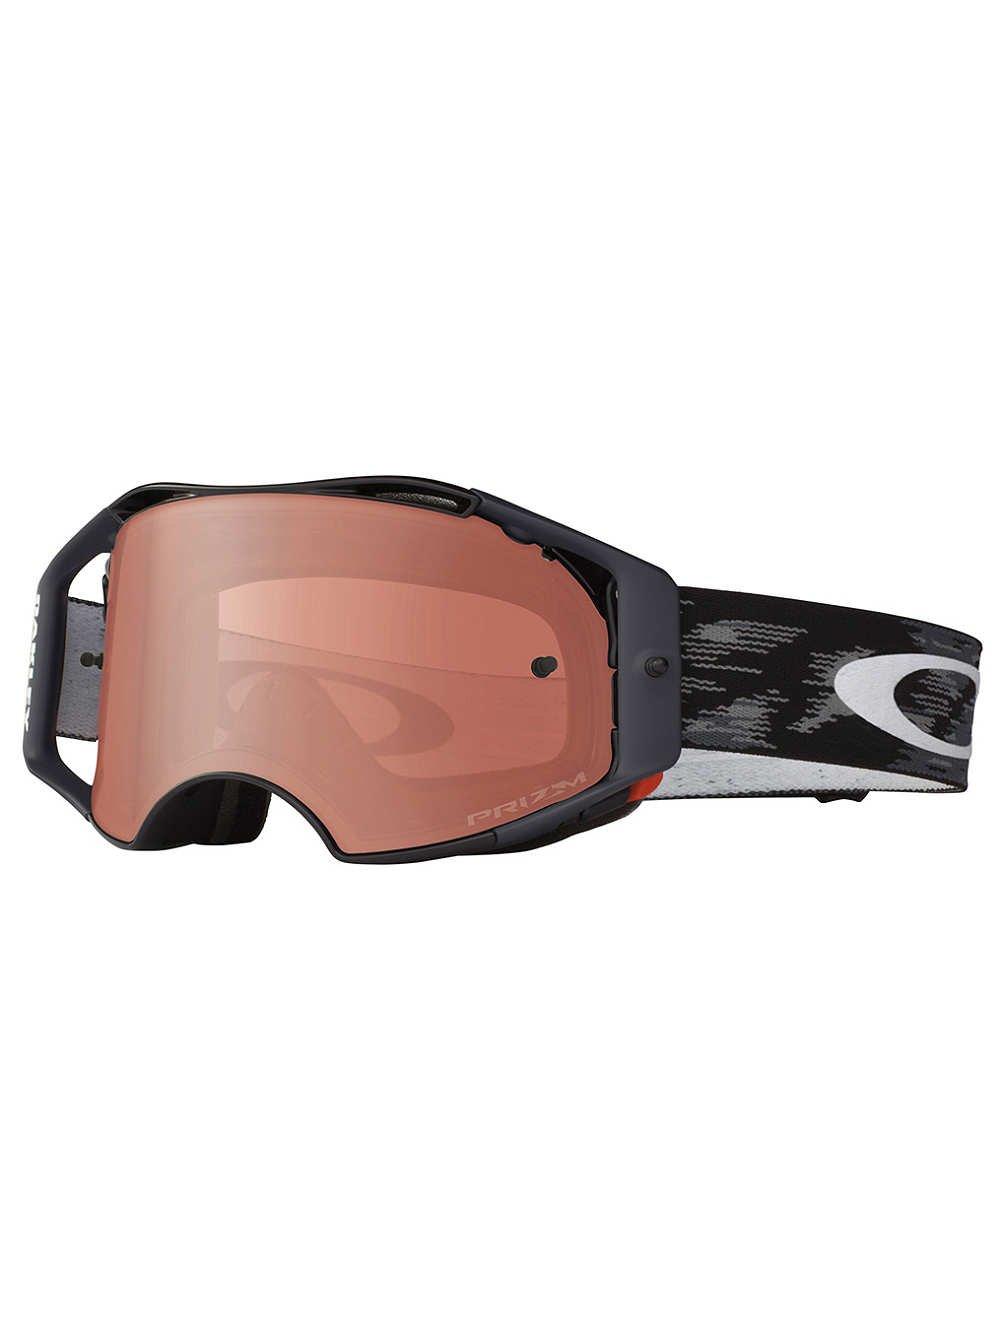 Oakley Unisex-Adult Goggles Black Medium